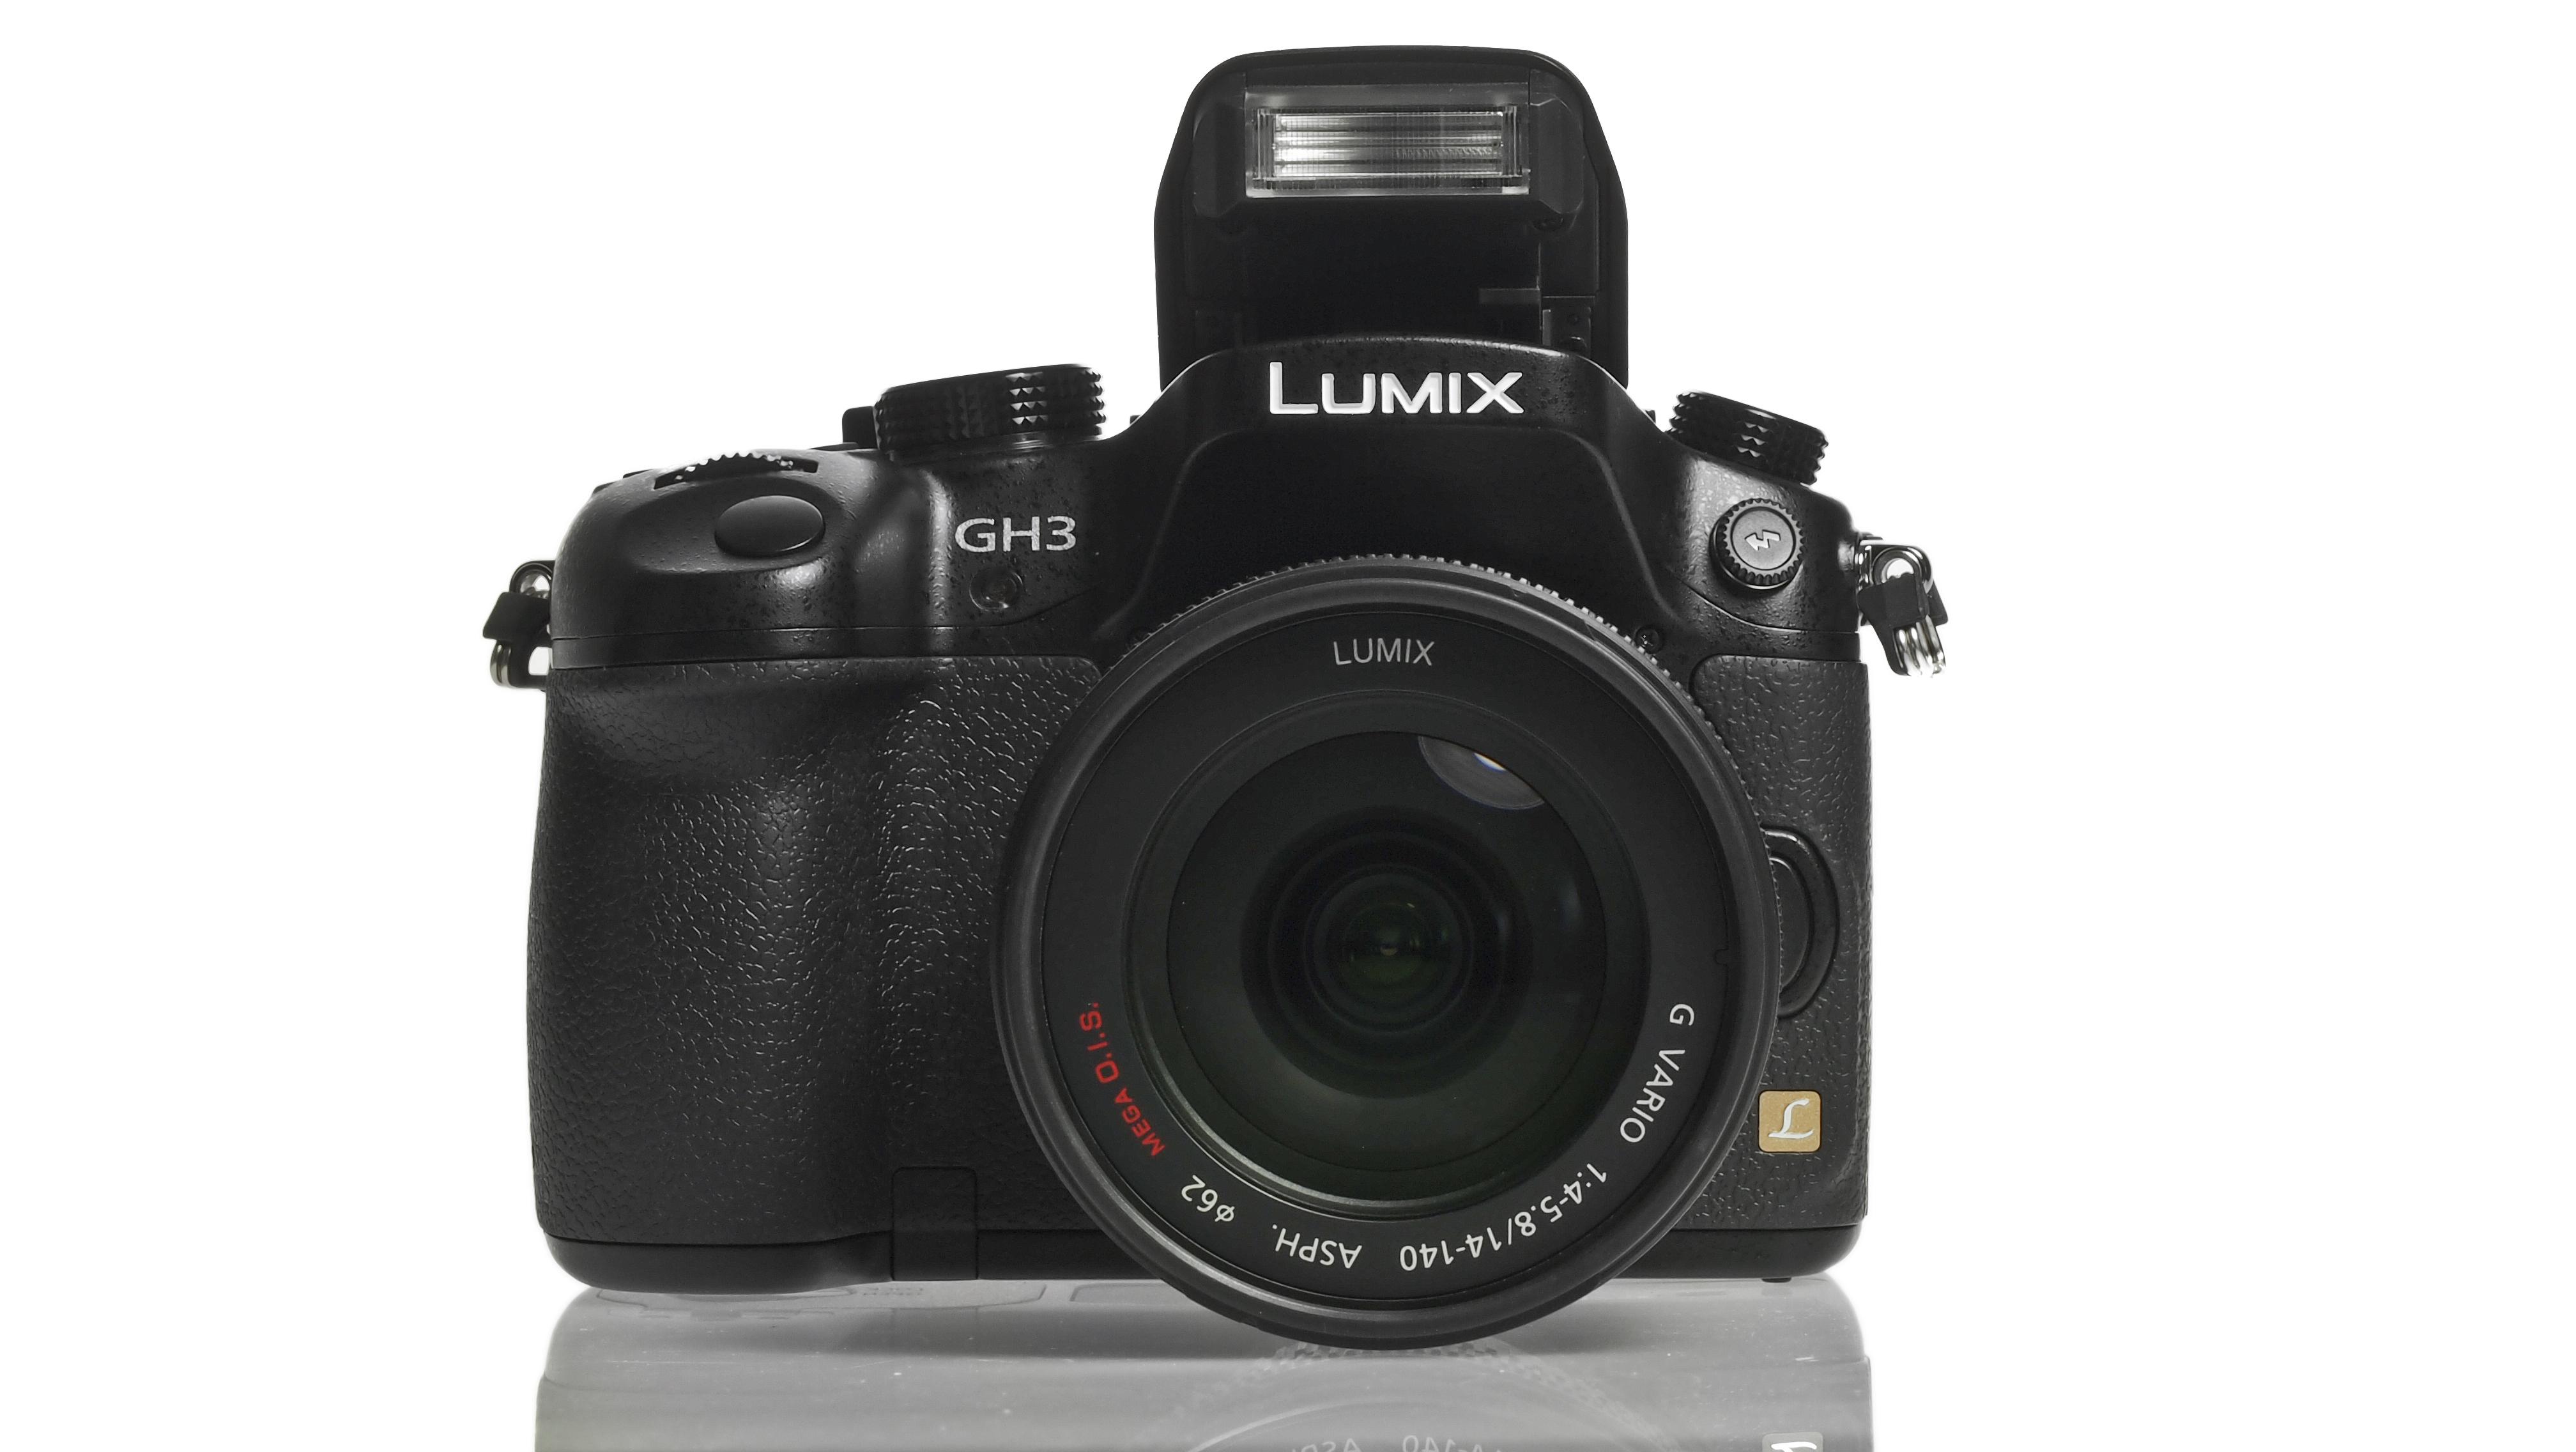 panasonic lumix gh3 specs